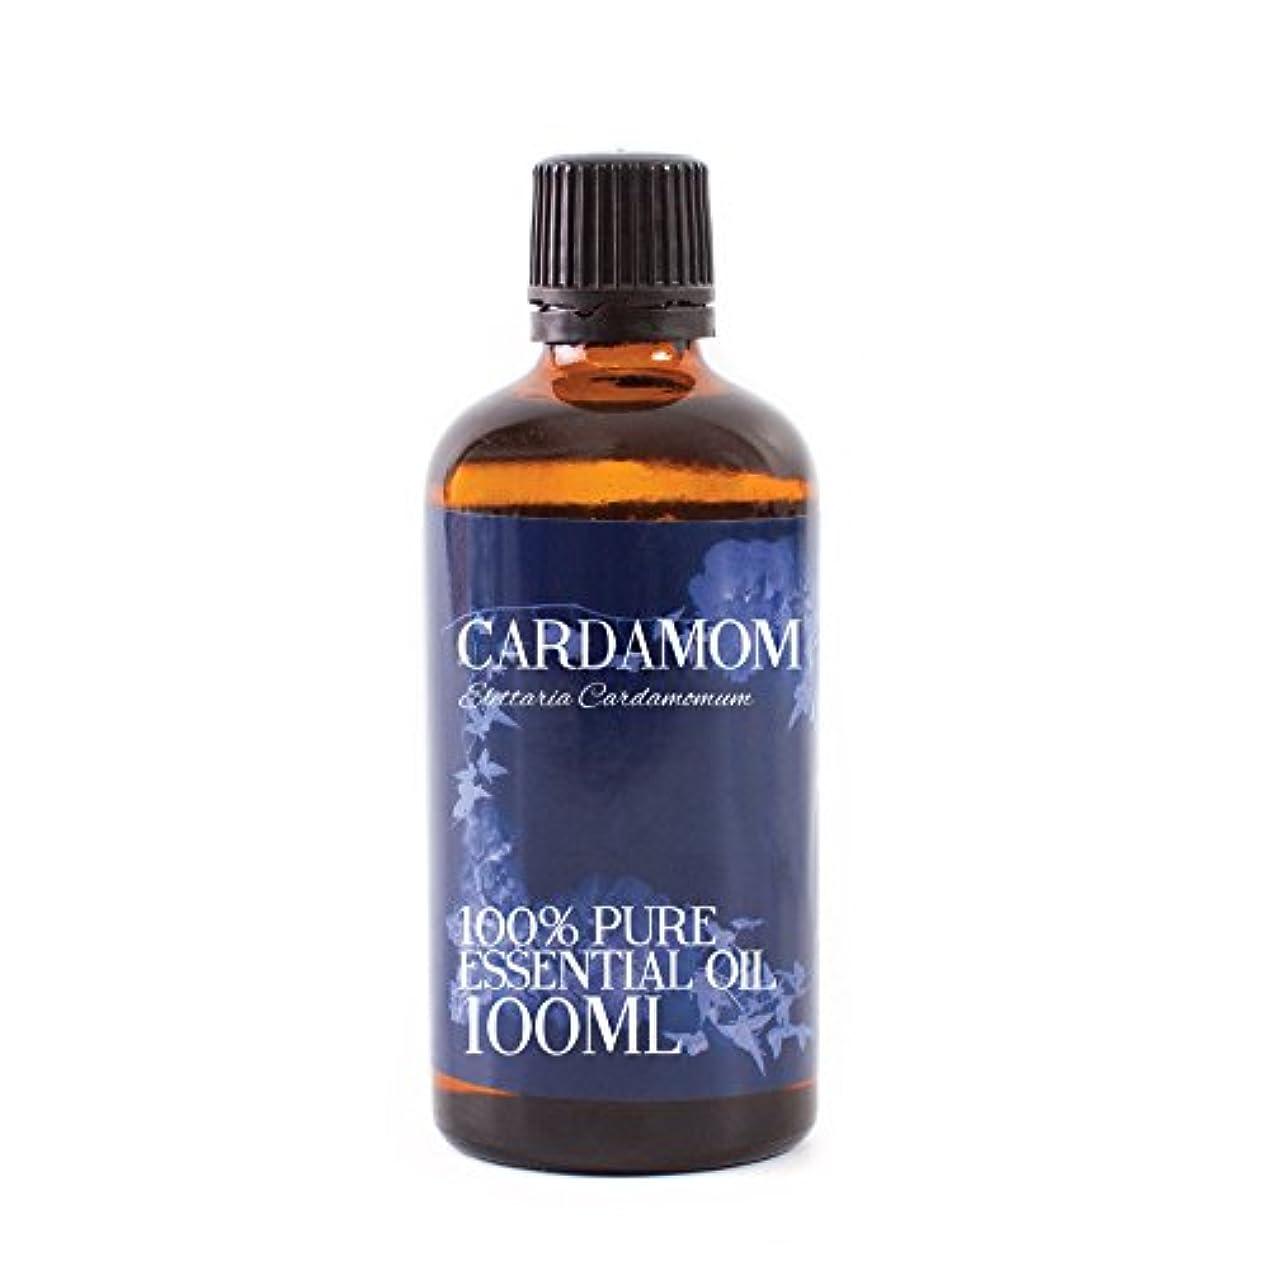 Mystic Moments   Cardamom Essential Oil - 100ml - 100% pure